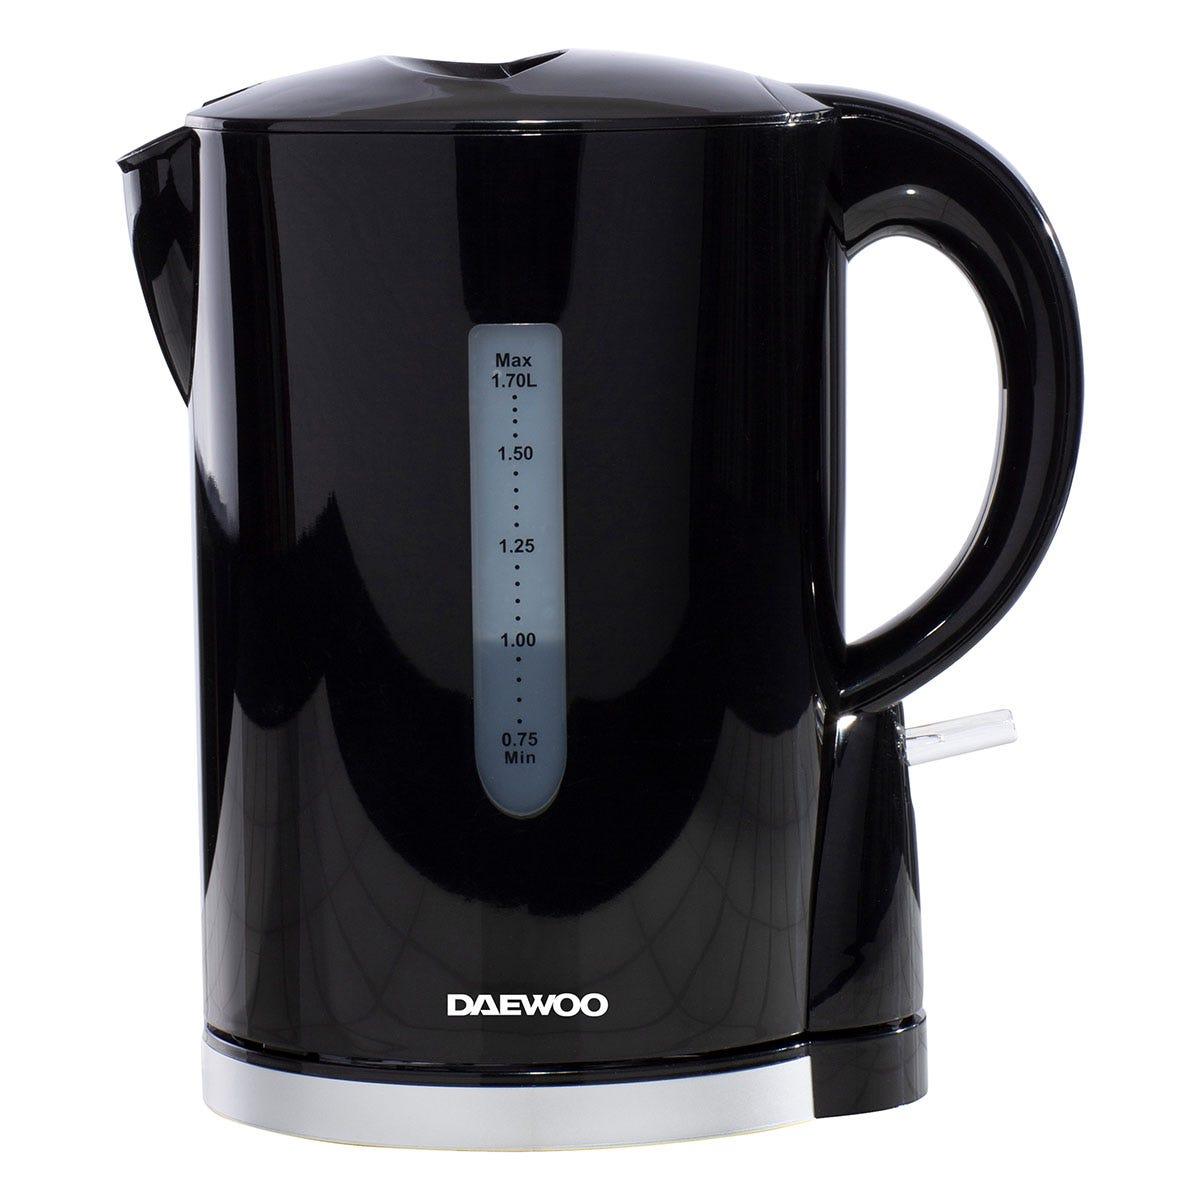 Daewoo SDA1682 1.7L 2200W Plastic Kettle - Black with Chrome Band